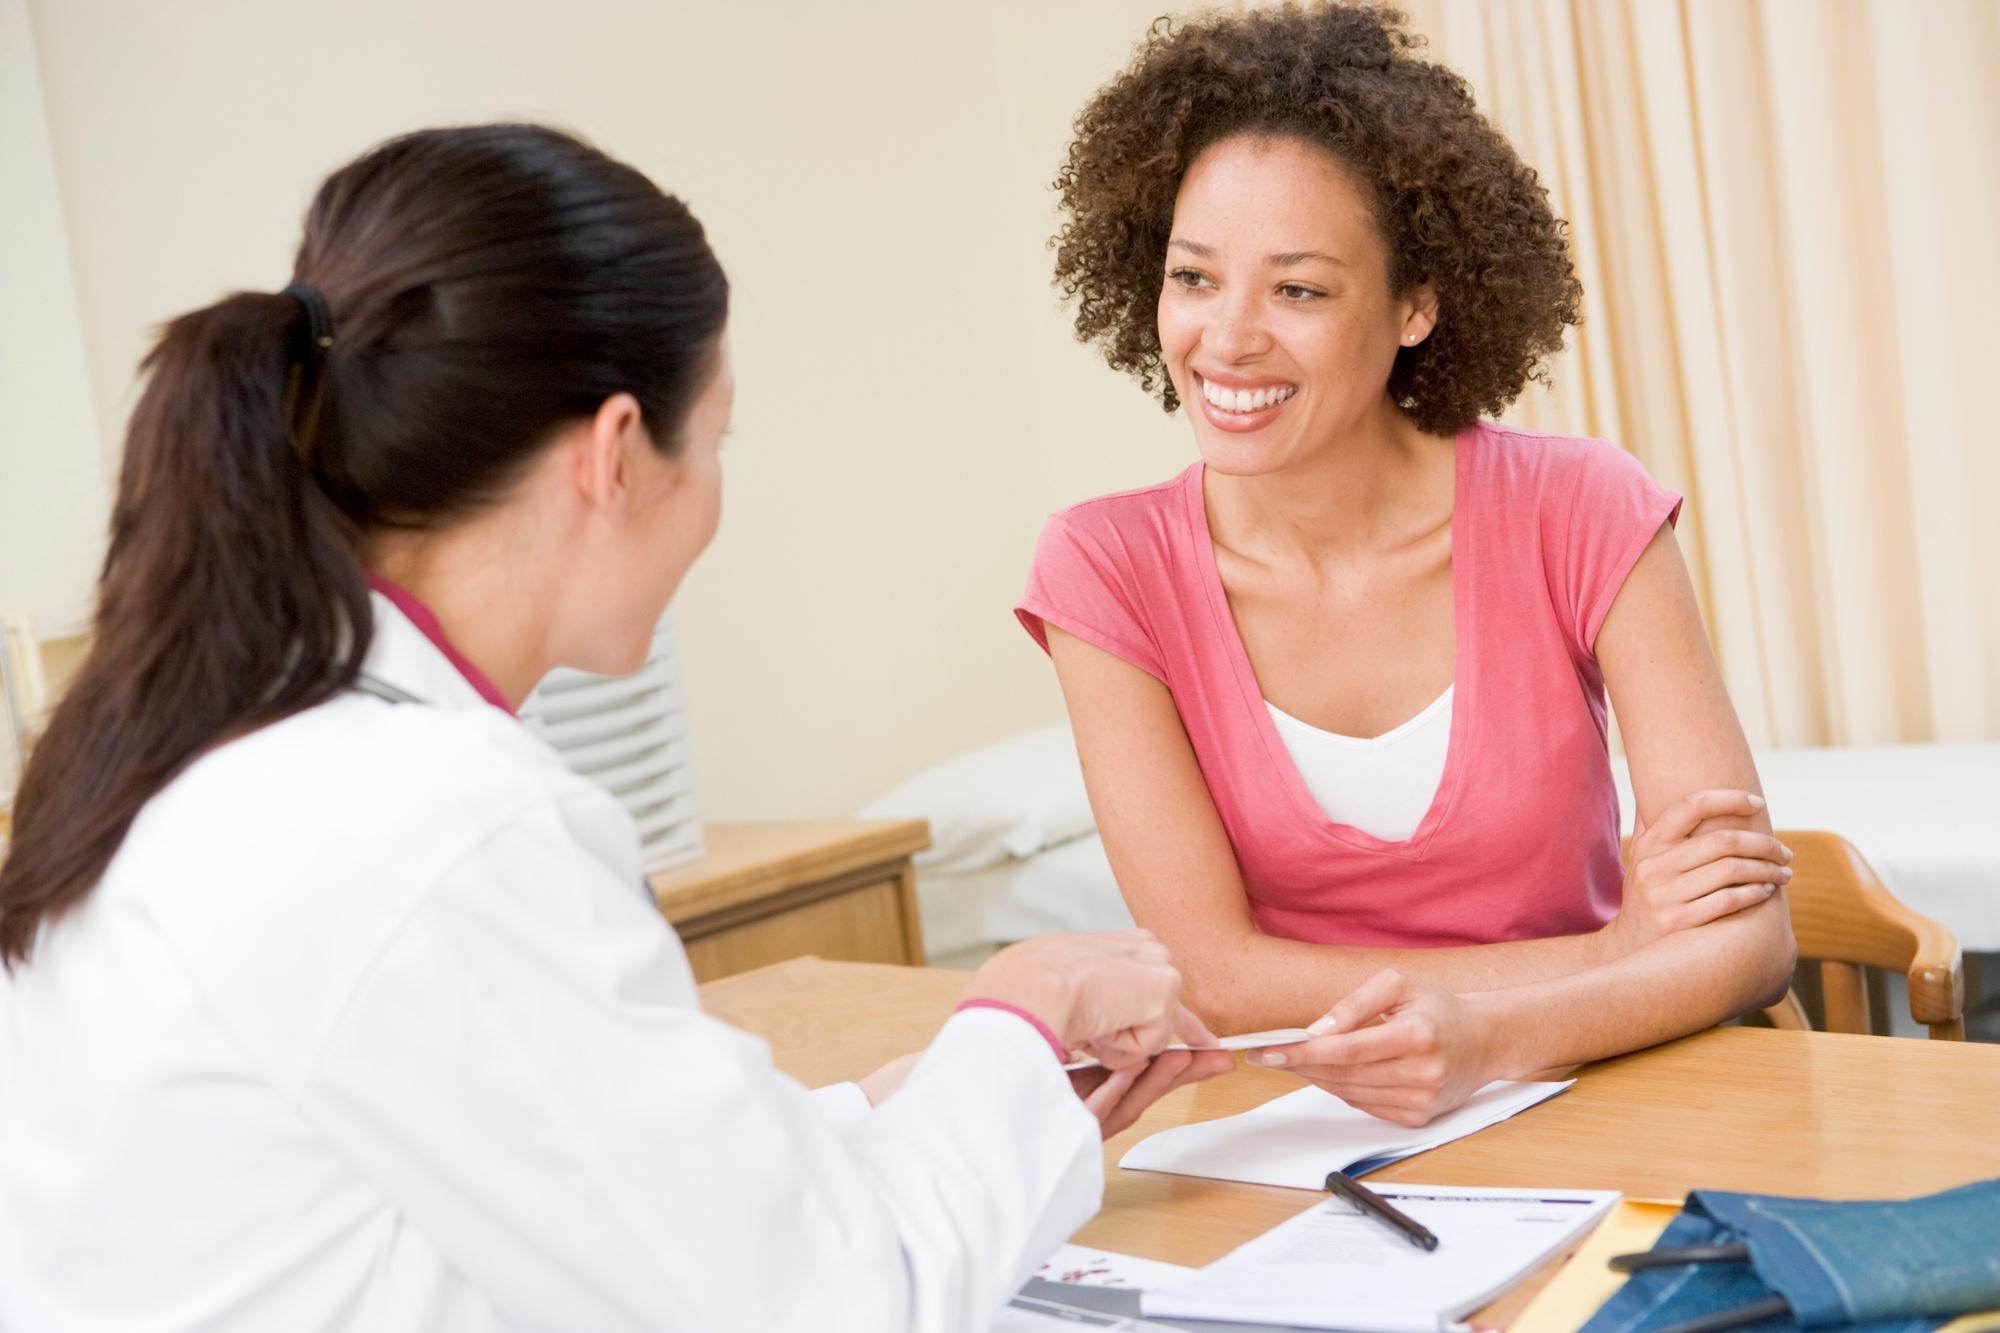 cervical health awareness month